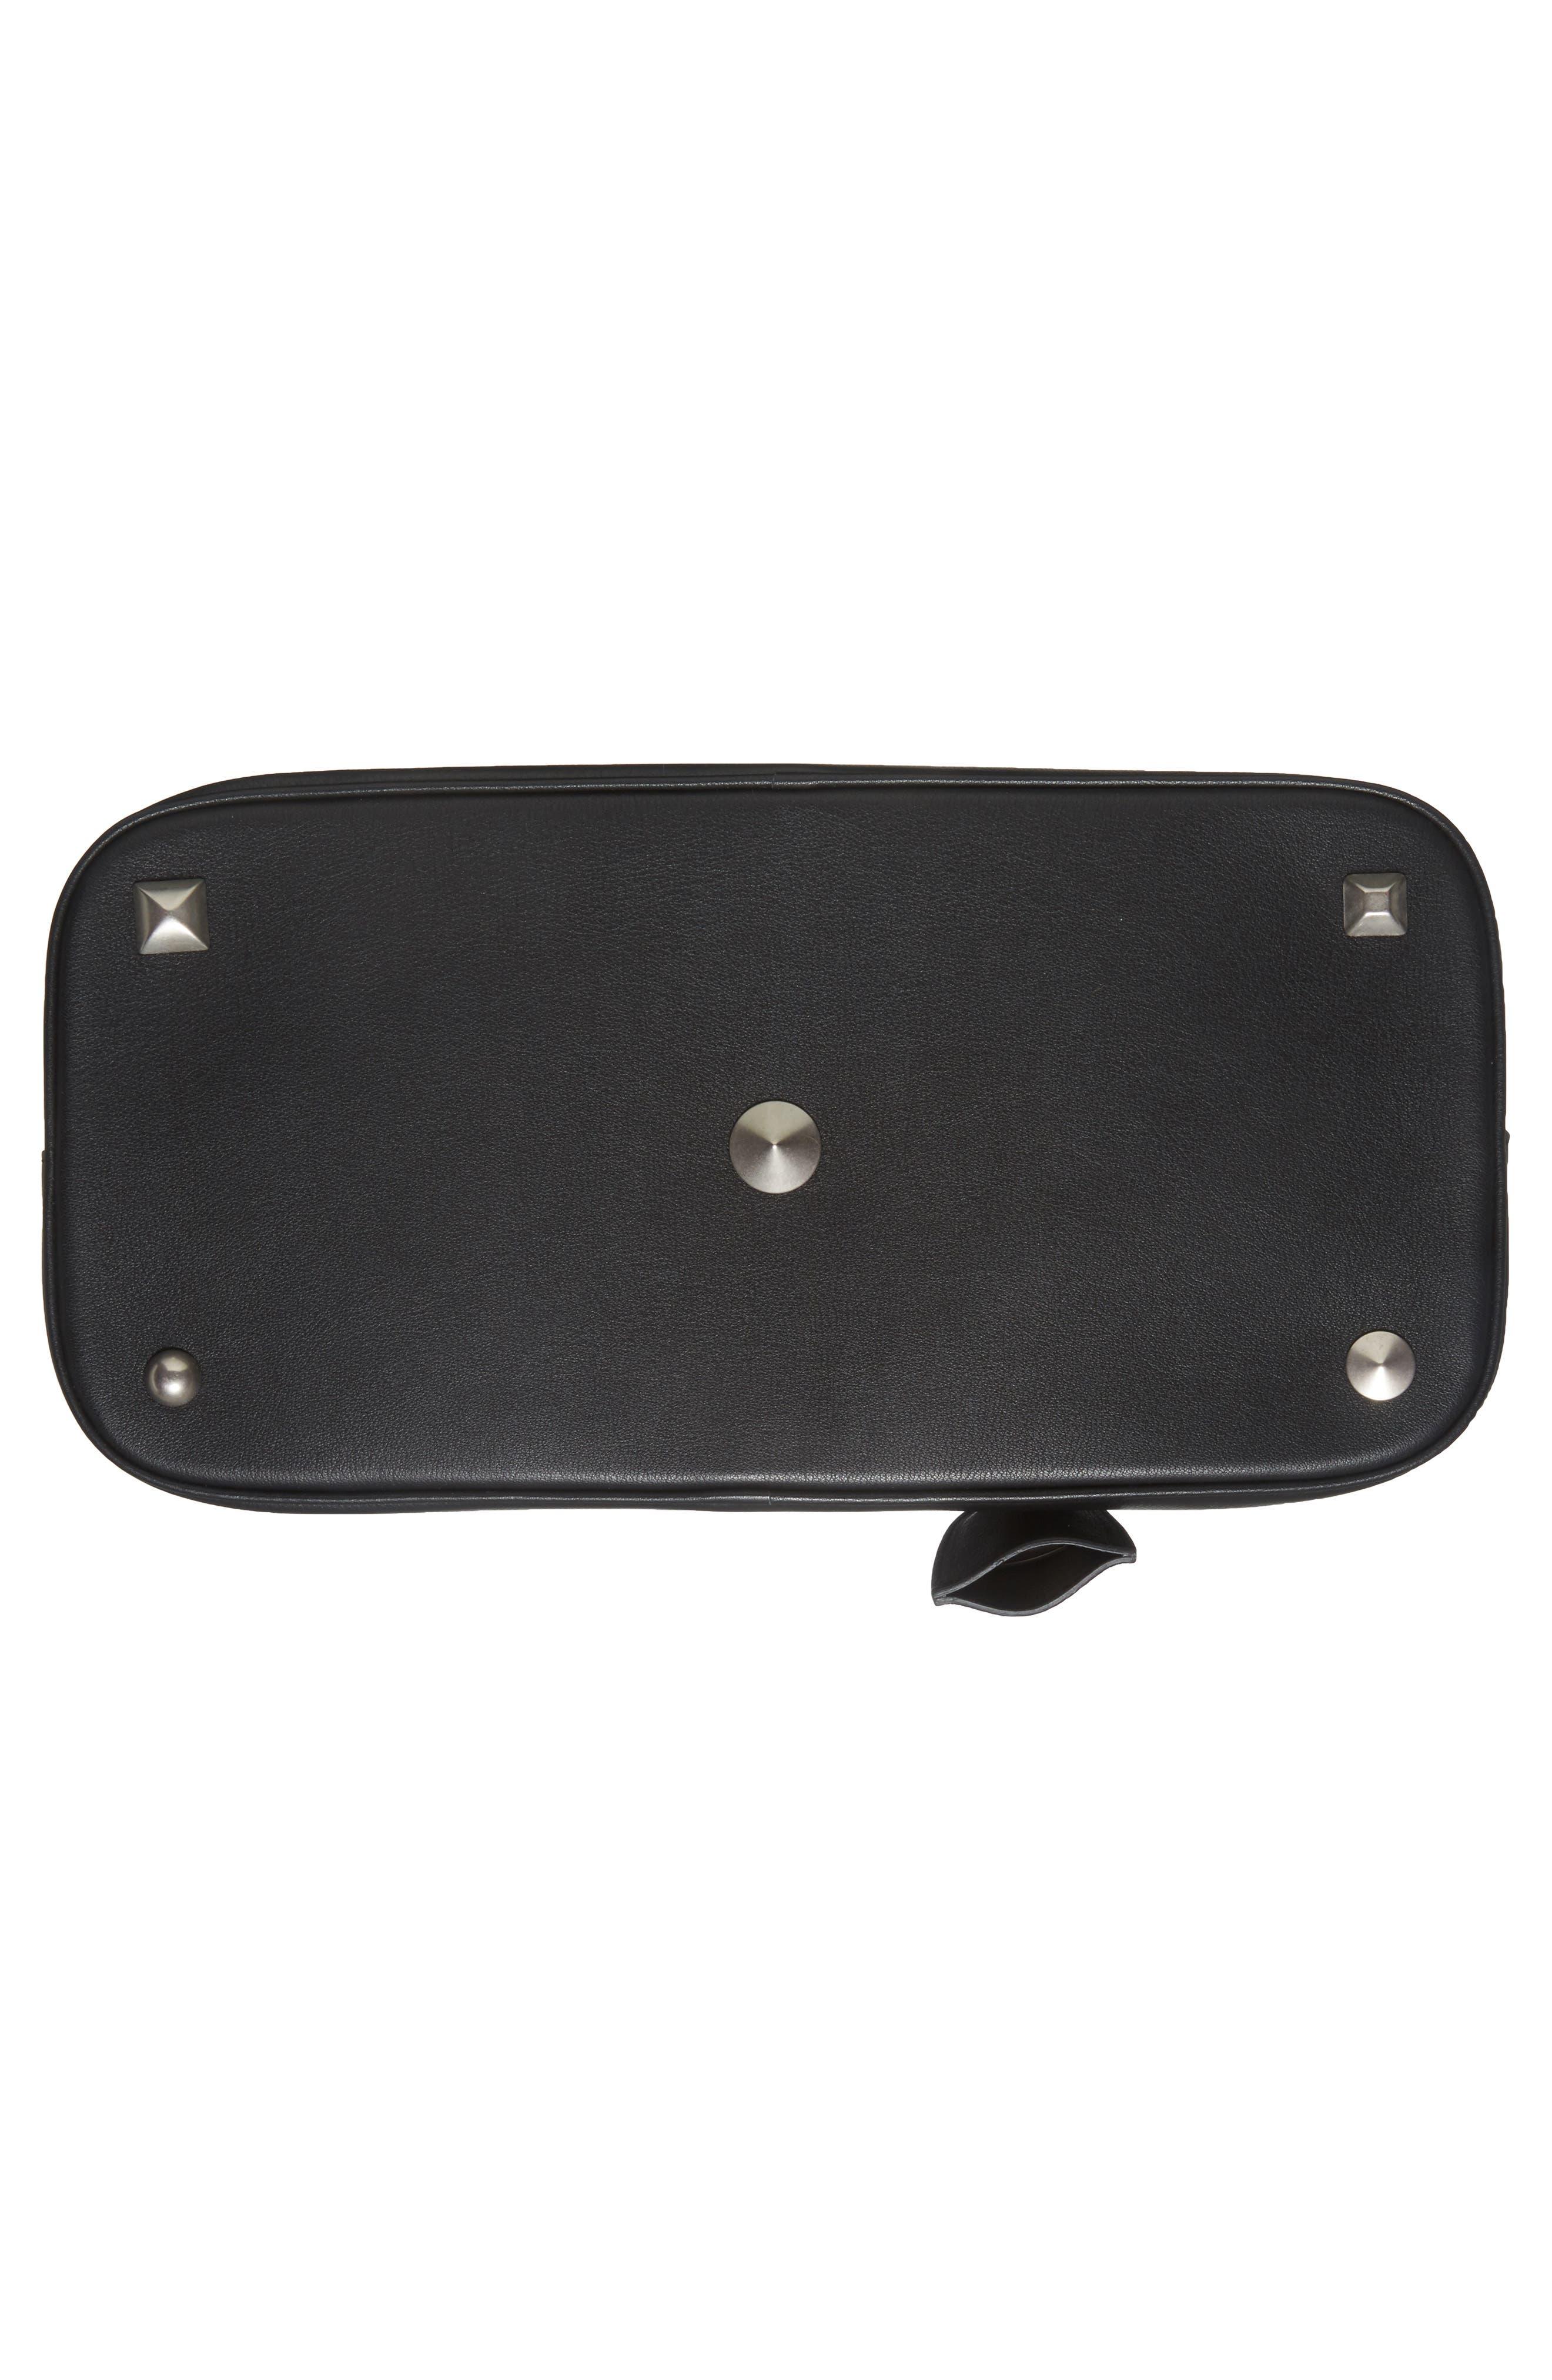 Medium 5AC Leather Handbag,                             Alternate thumbnail 6, color,                             Black